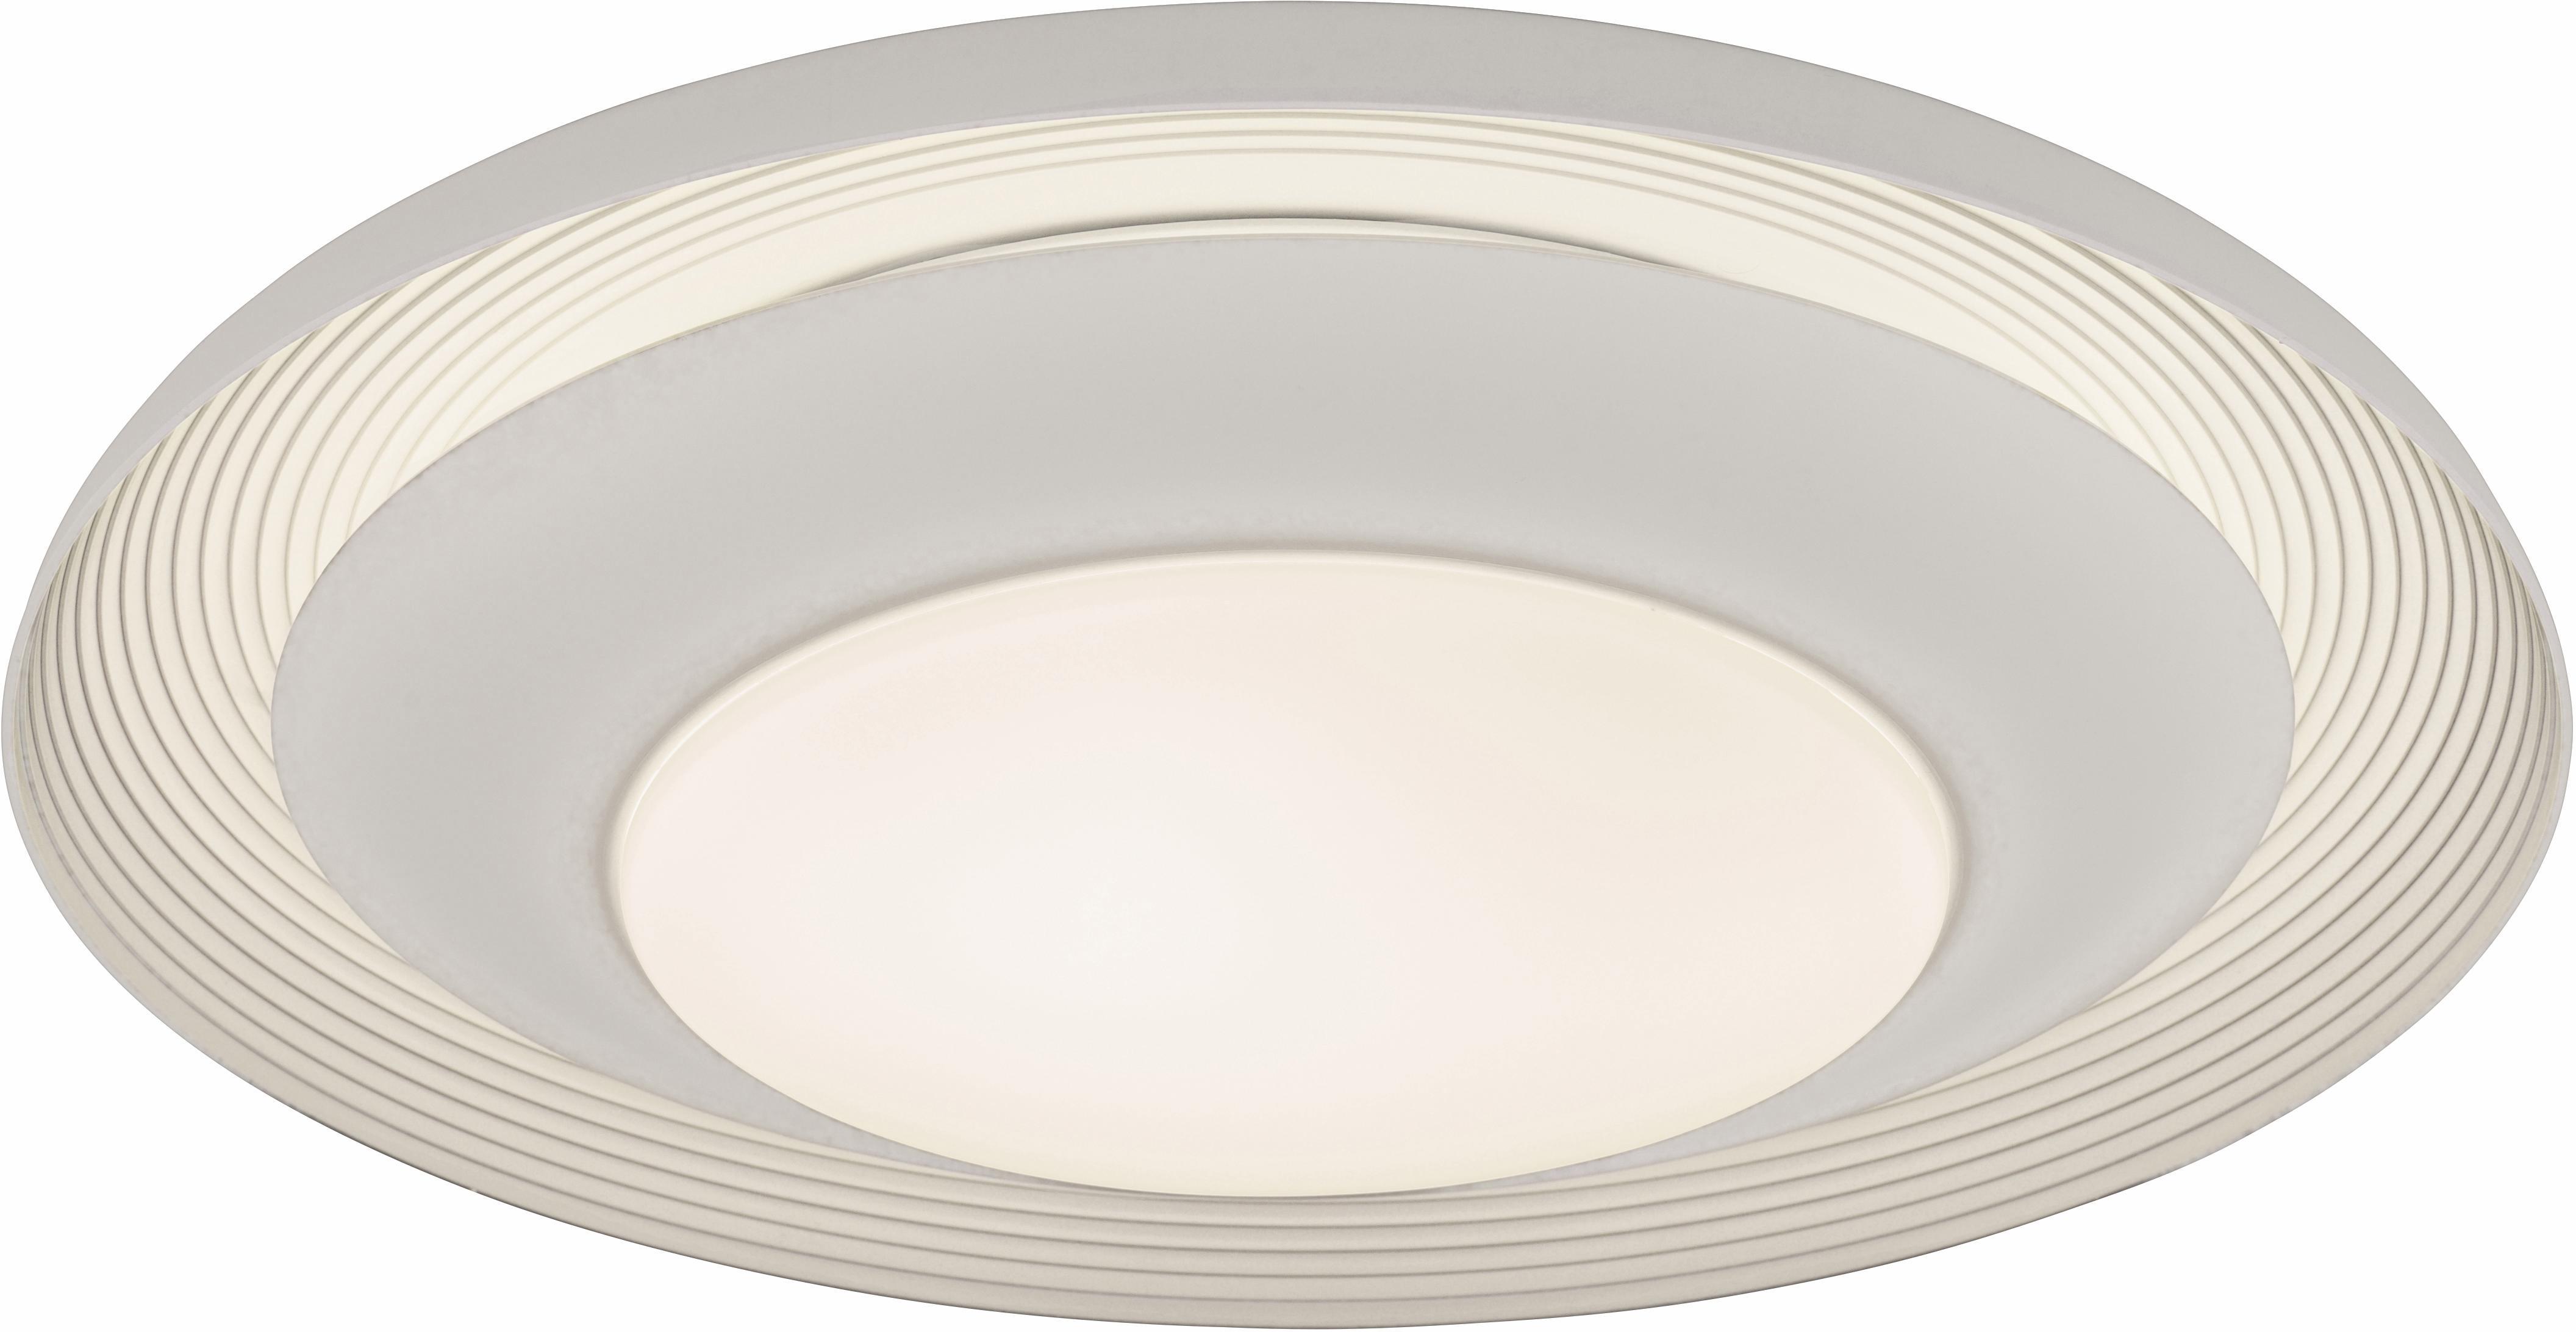 EGLO LED Deckenleuchte CANICOSA